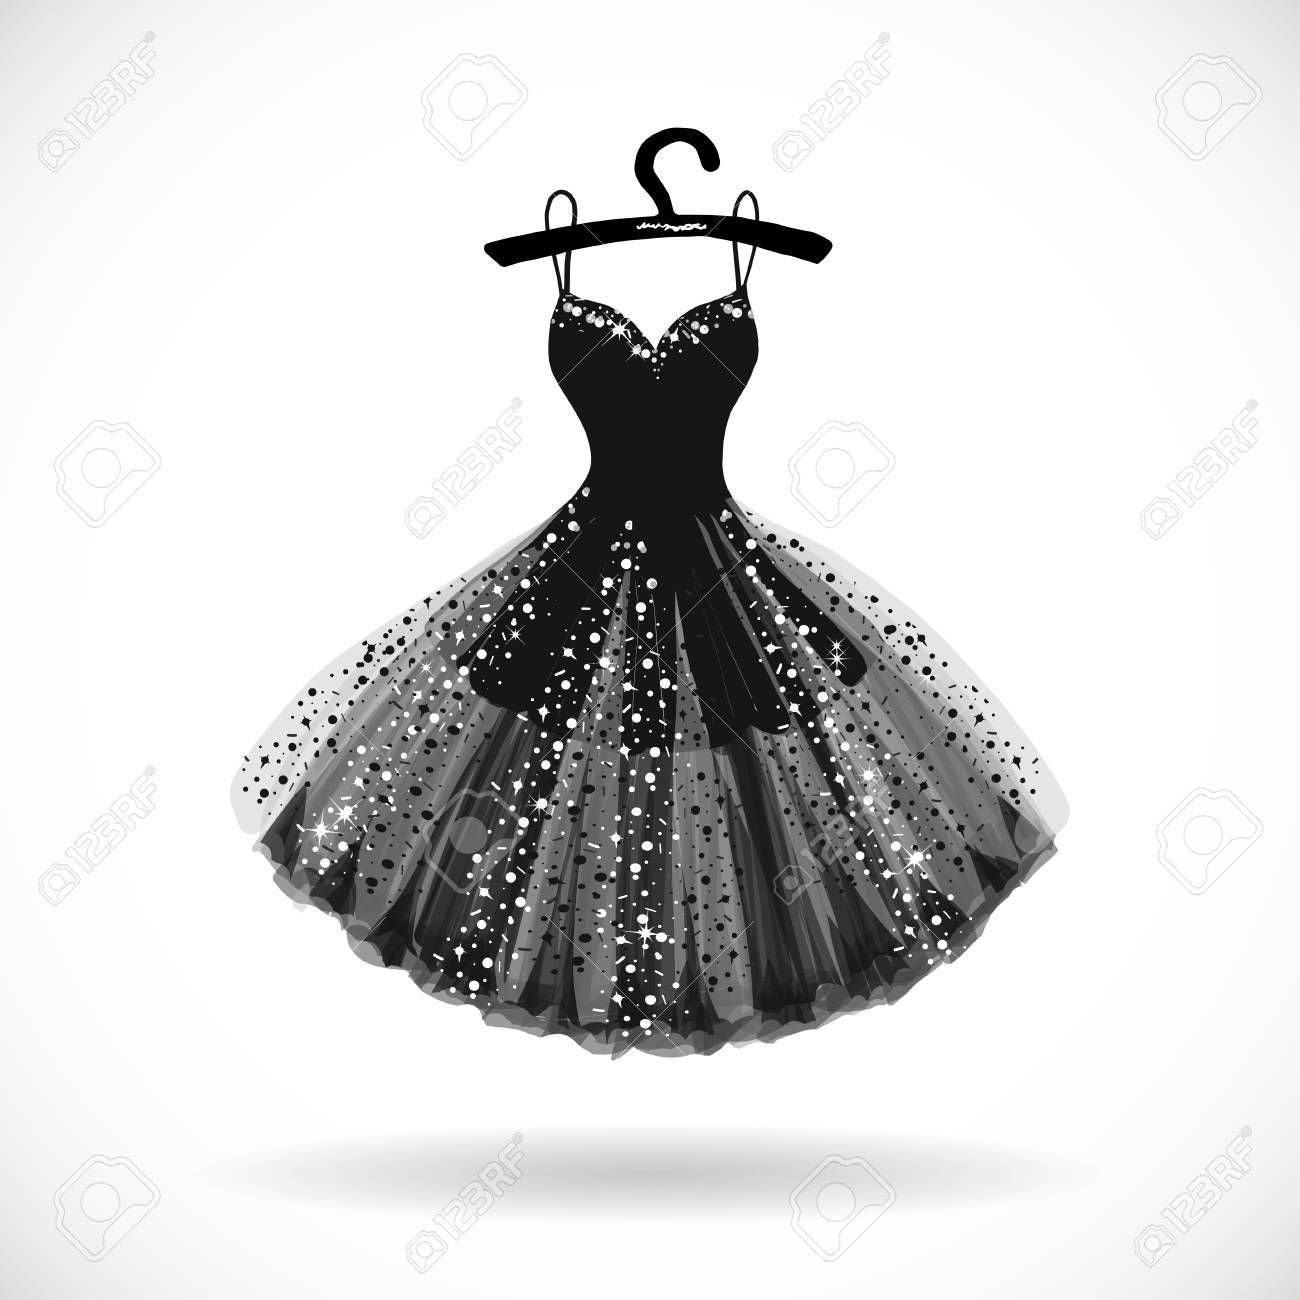 Shiny Little black dress hand drawn vector illustration. - 95574861